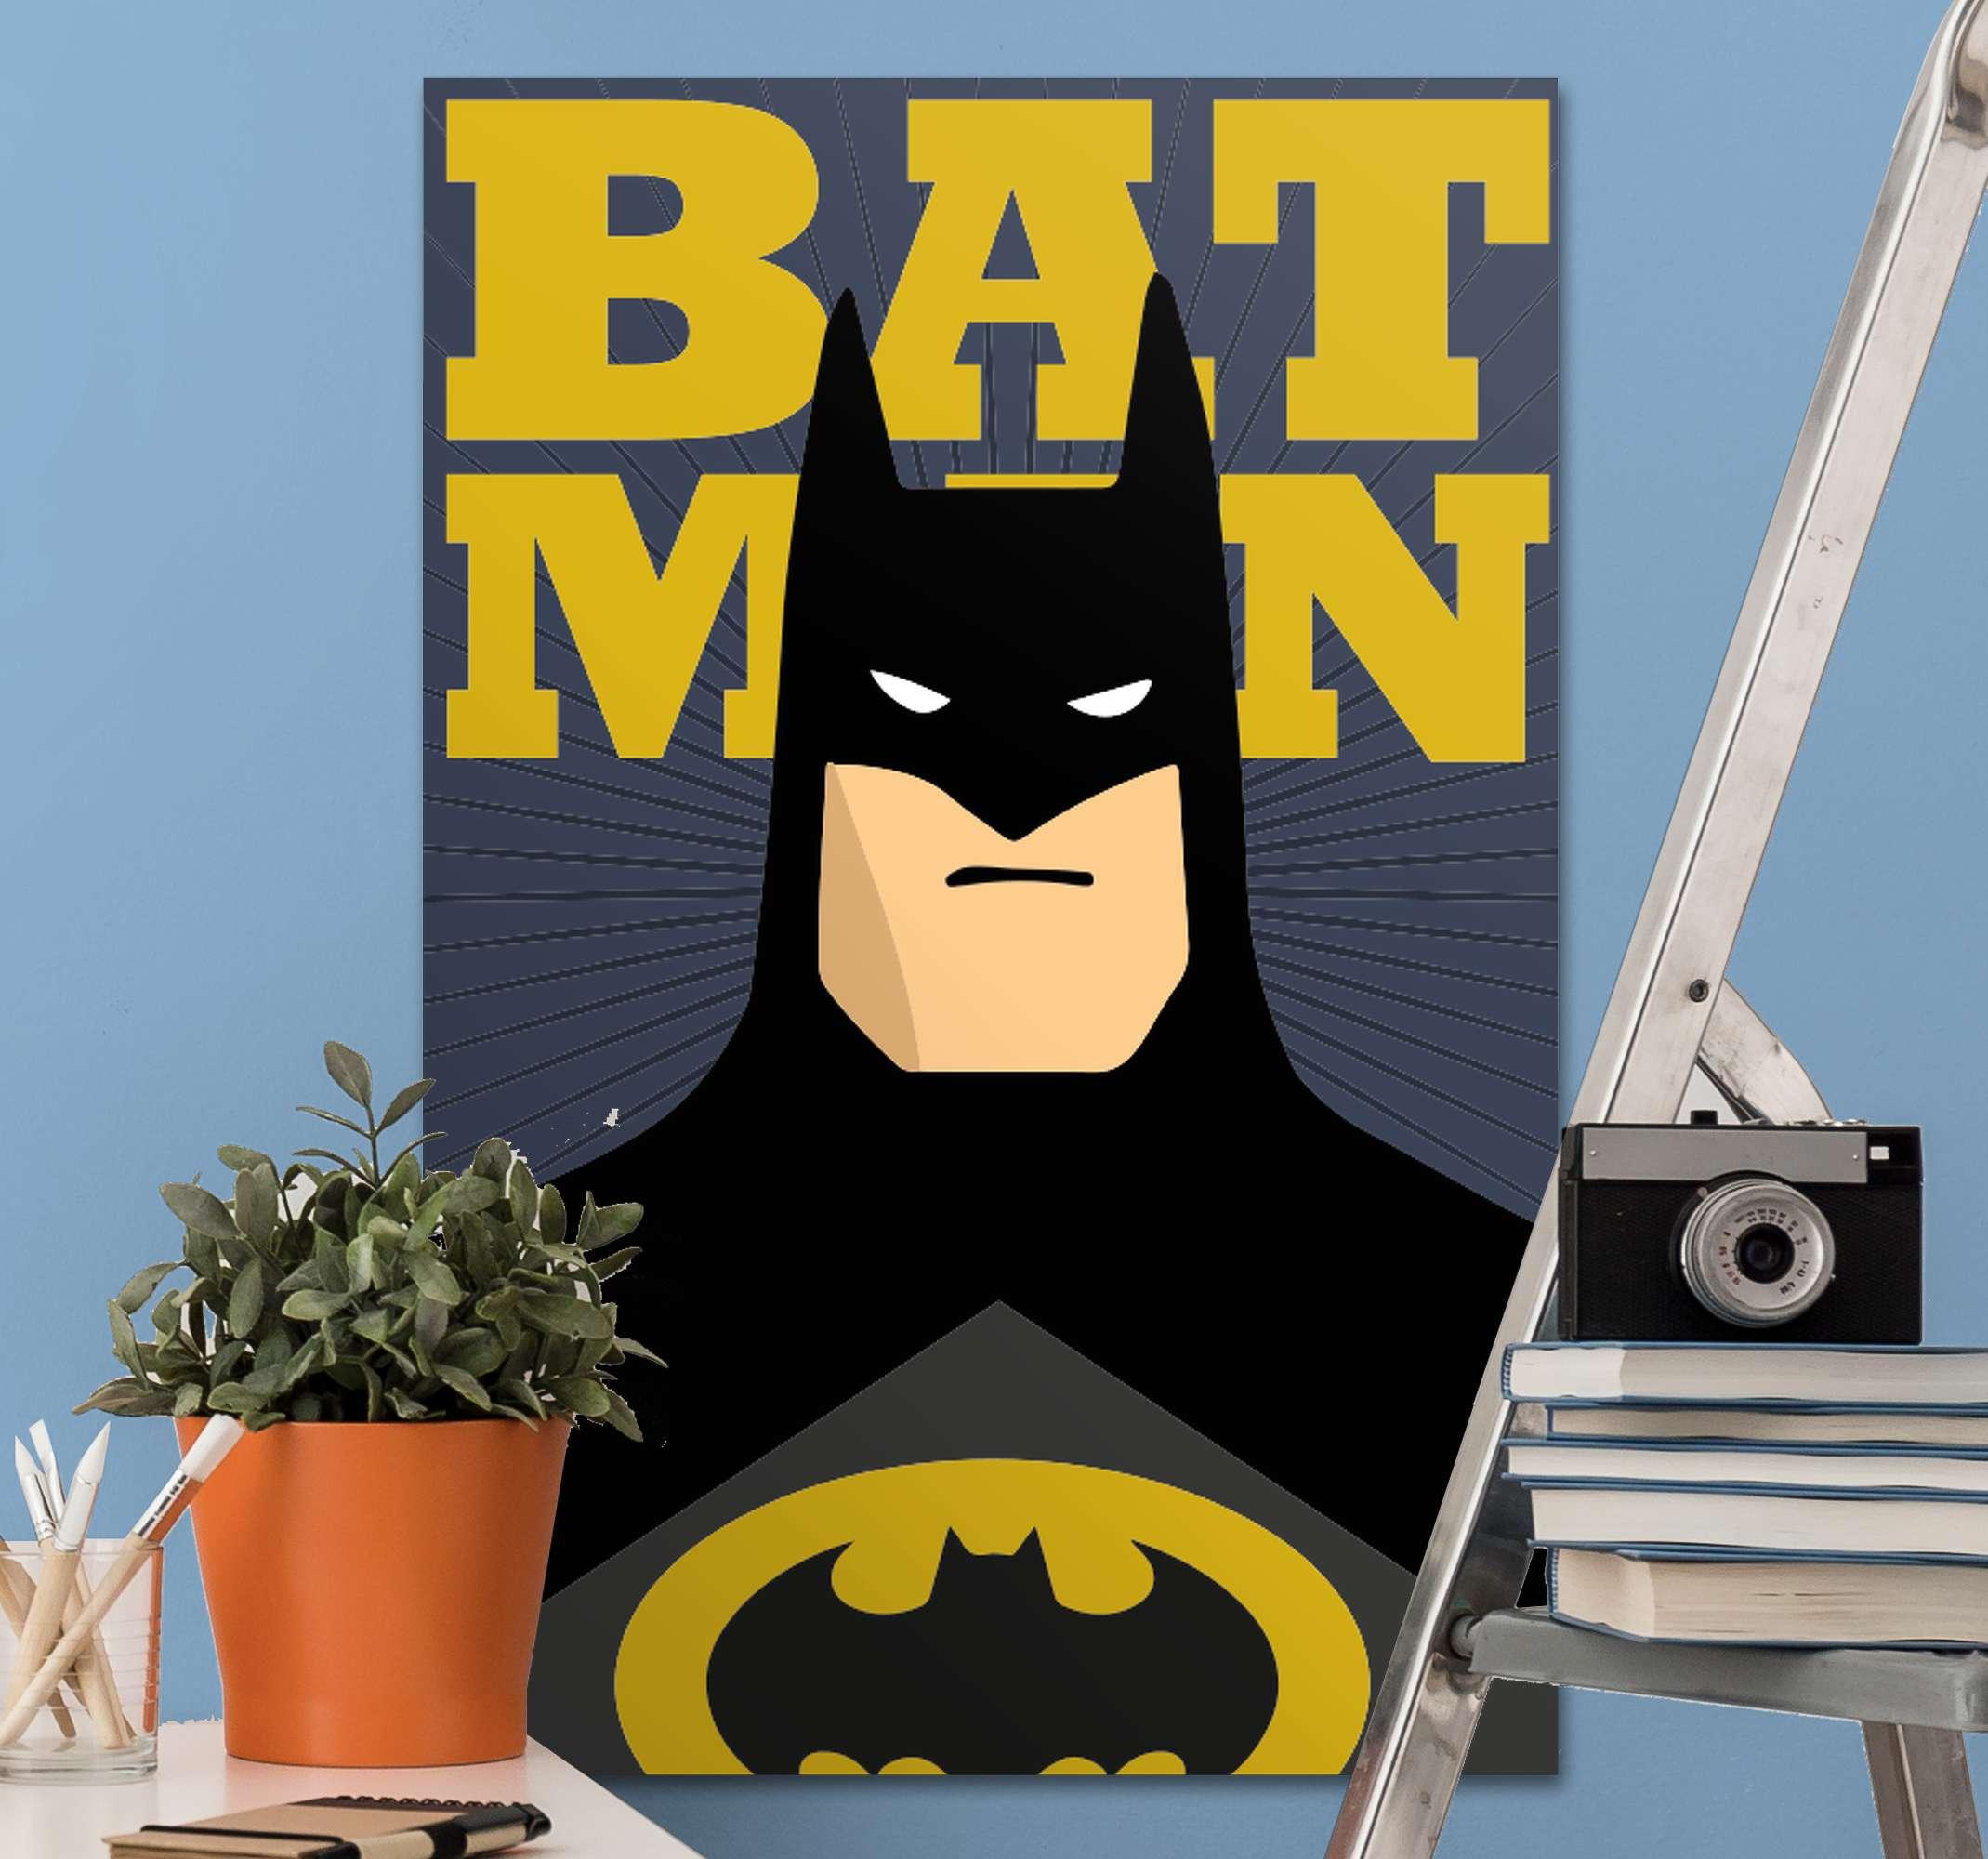 "TenStickers. Superhéroes 배트맨 슈퍼 히어로 액자 벽 예술. 배트맨으로 캔버스 인쇄. 검은 옷을 입은 배트맨의 흉상과 ""배트맨""이라는 텍스트가 표시됩니다. 고품질 소재로 제작되었습니다. 확인 해봐!"